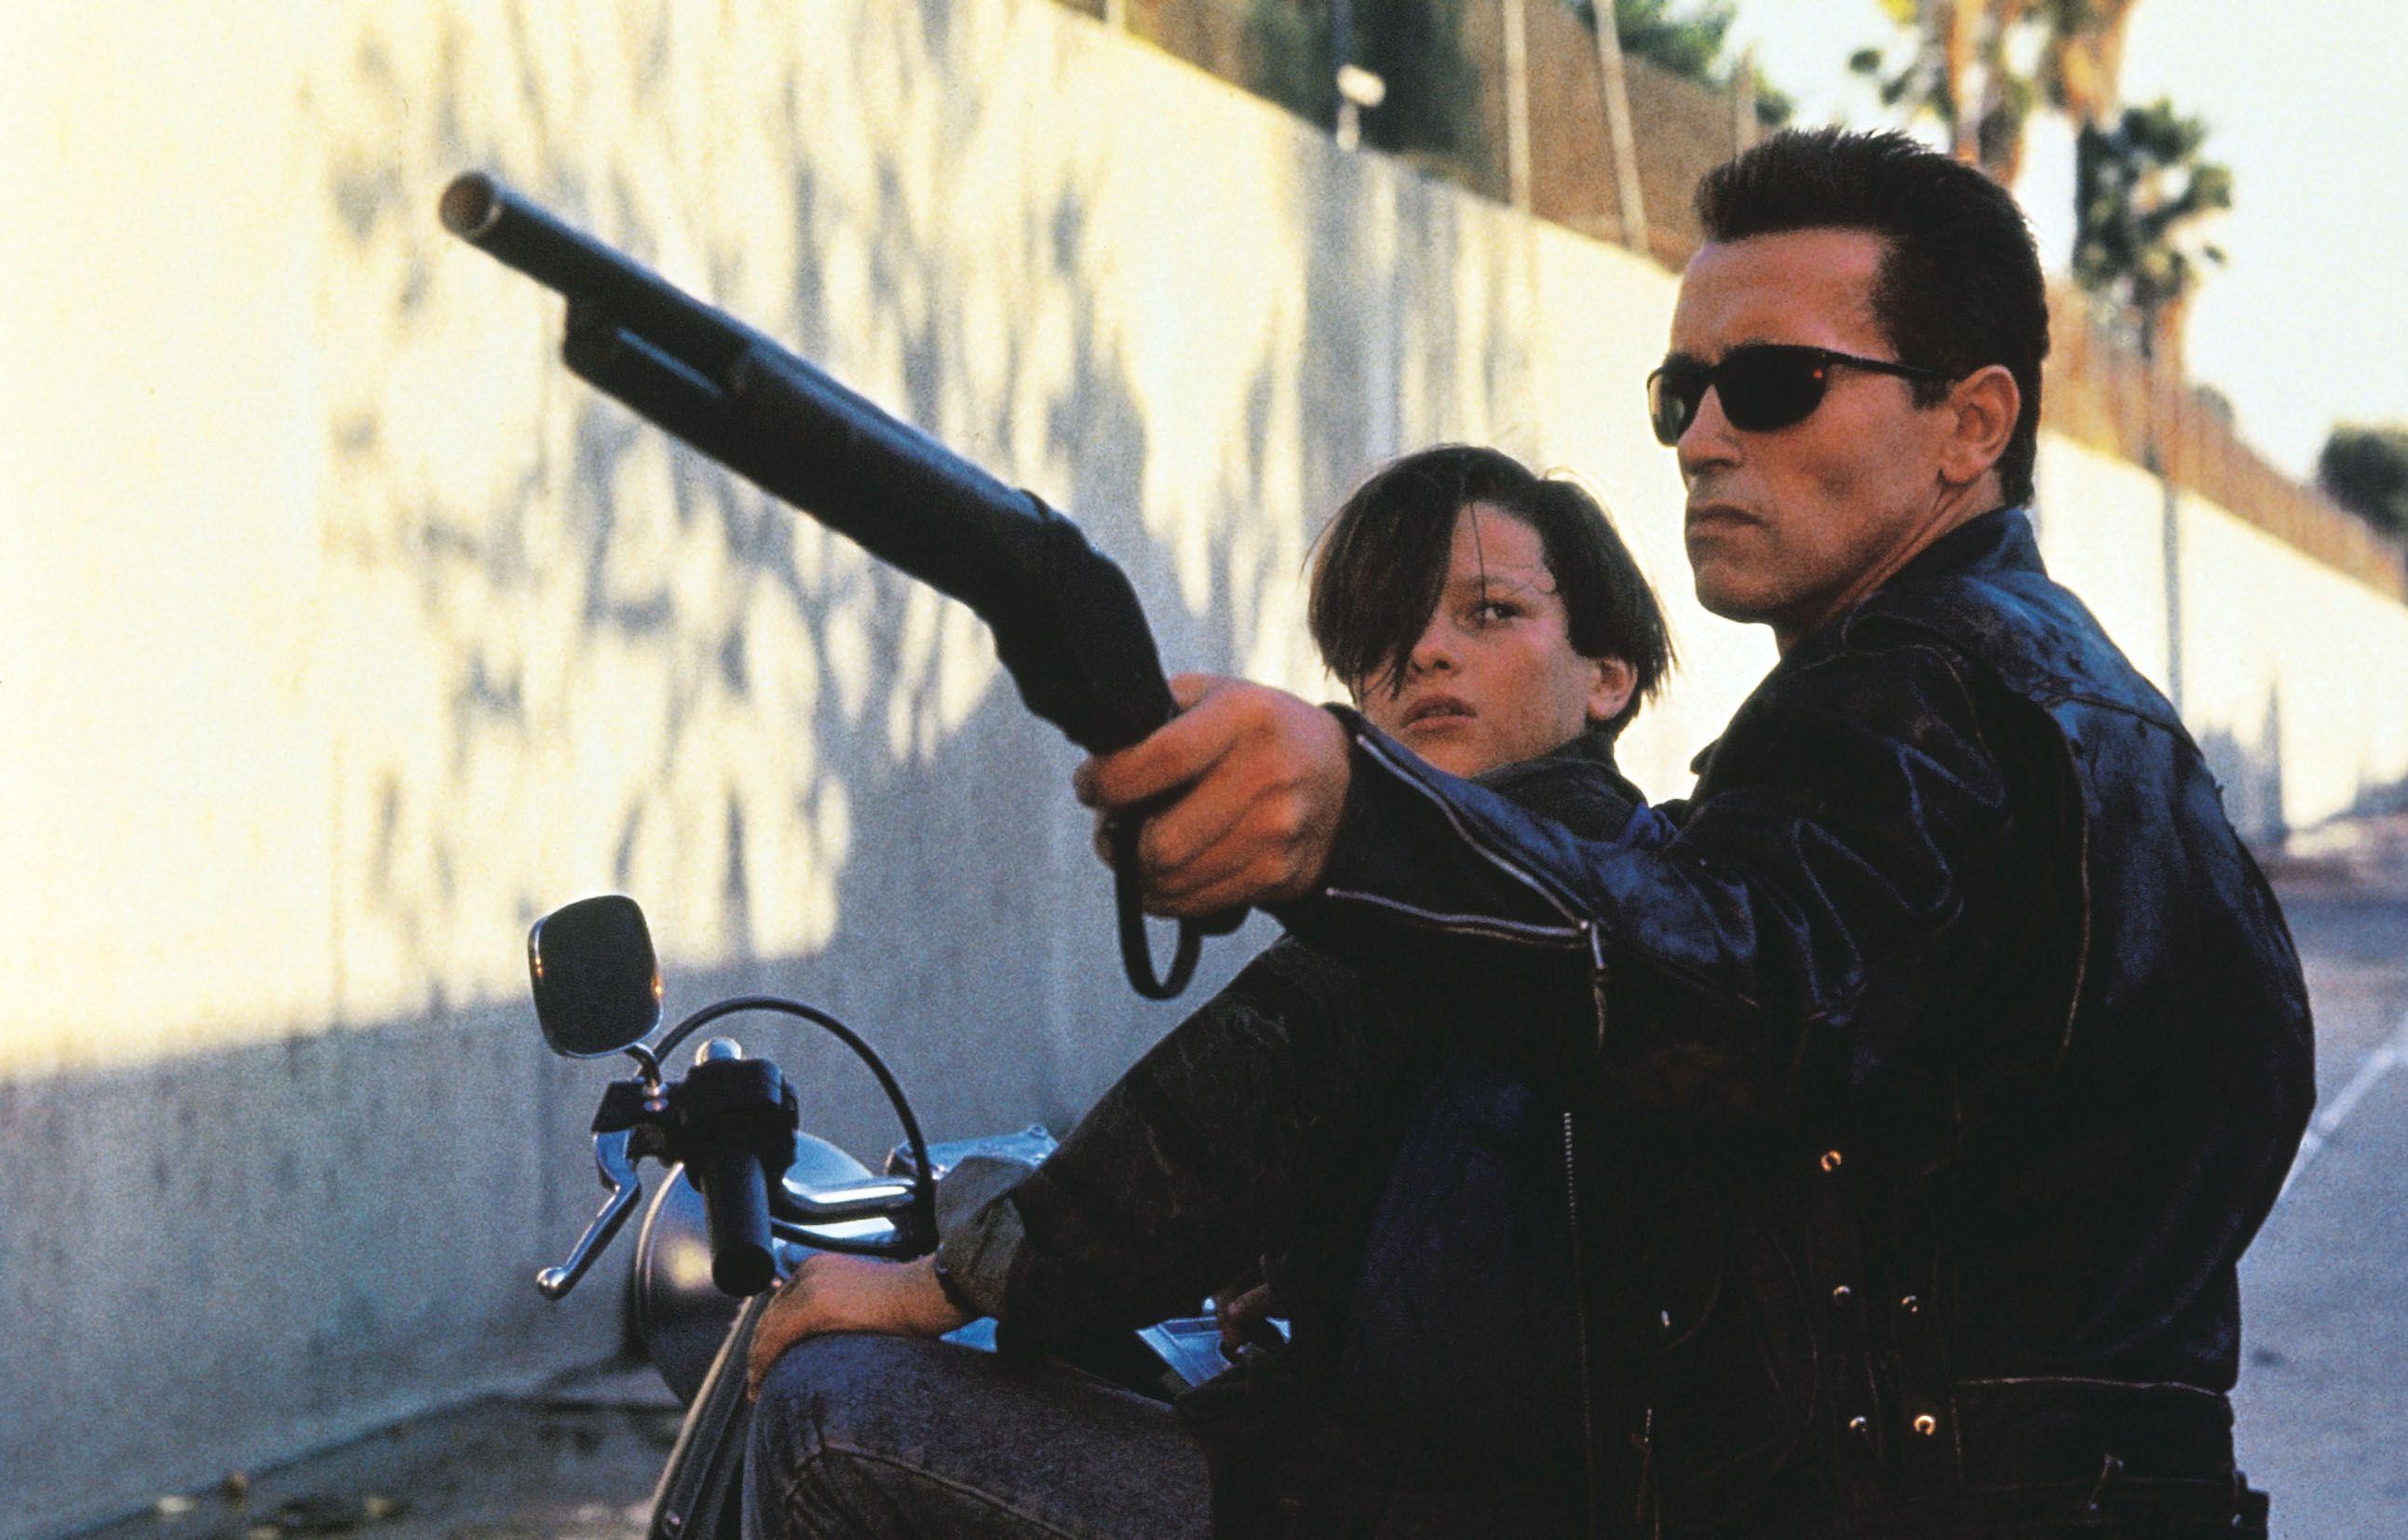 I'll be back, une phrase culte pour la saga Terminator, qui ne cesse de se renouveler